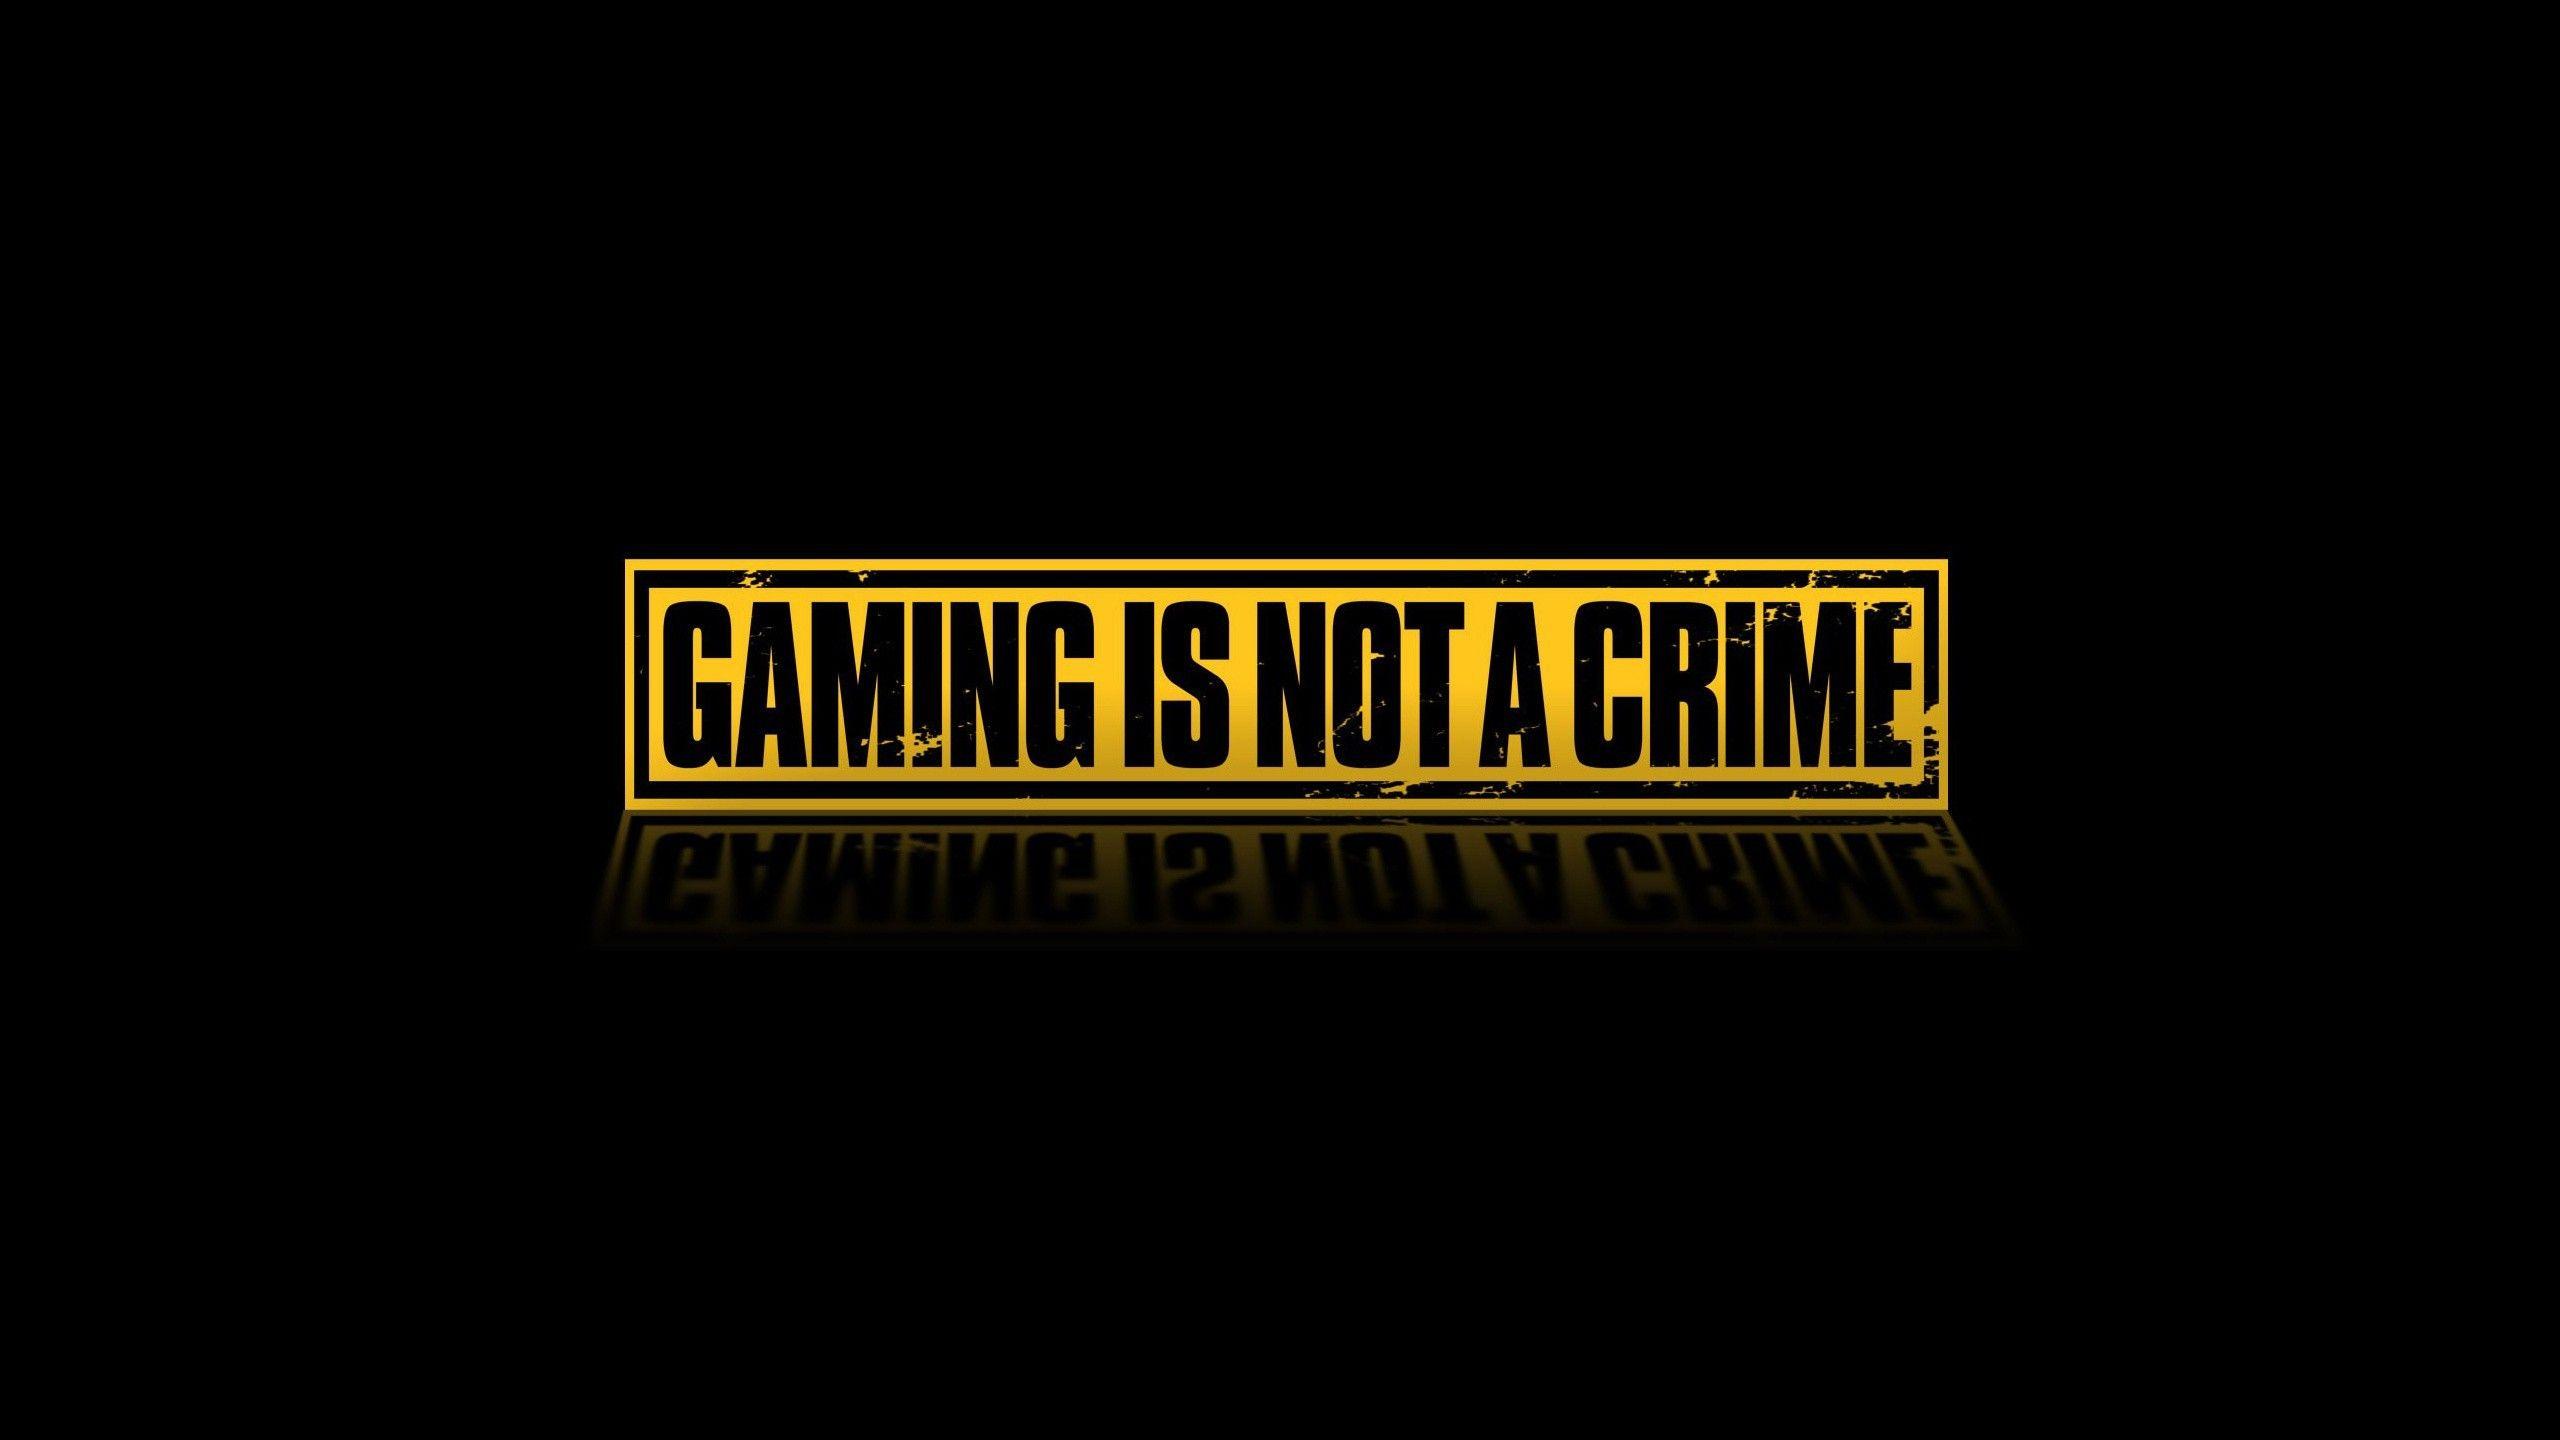 2560x1440 Video Games Wallpaper 2560x1440 Video Games Text